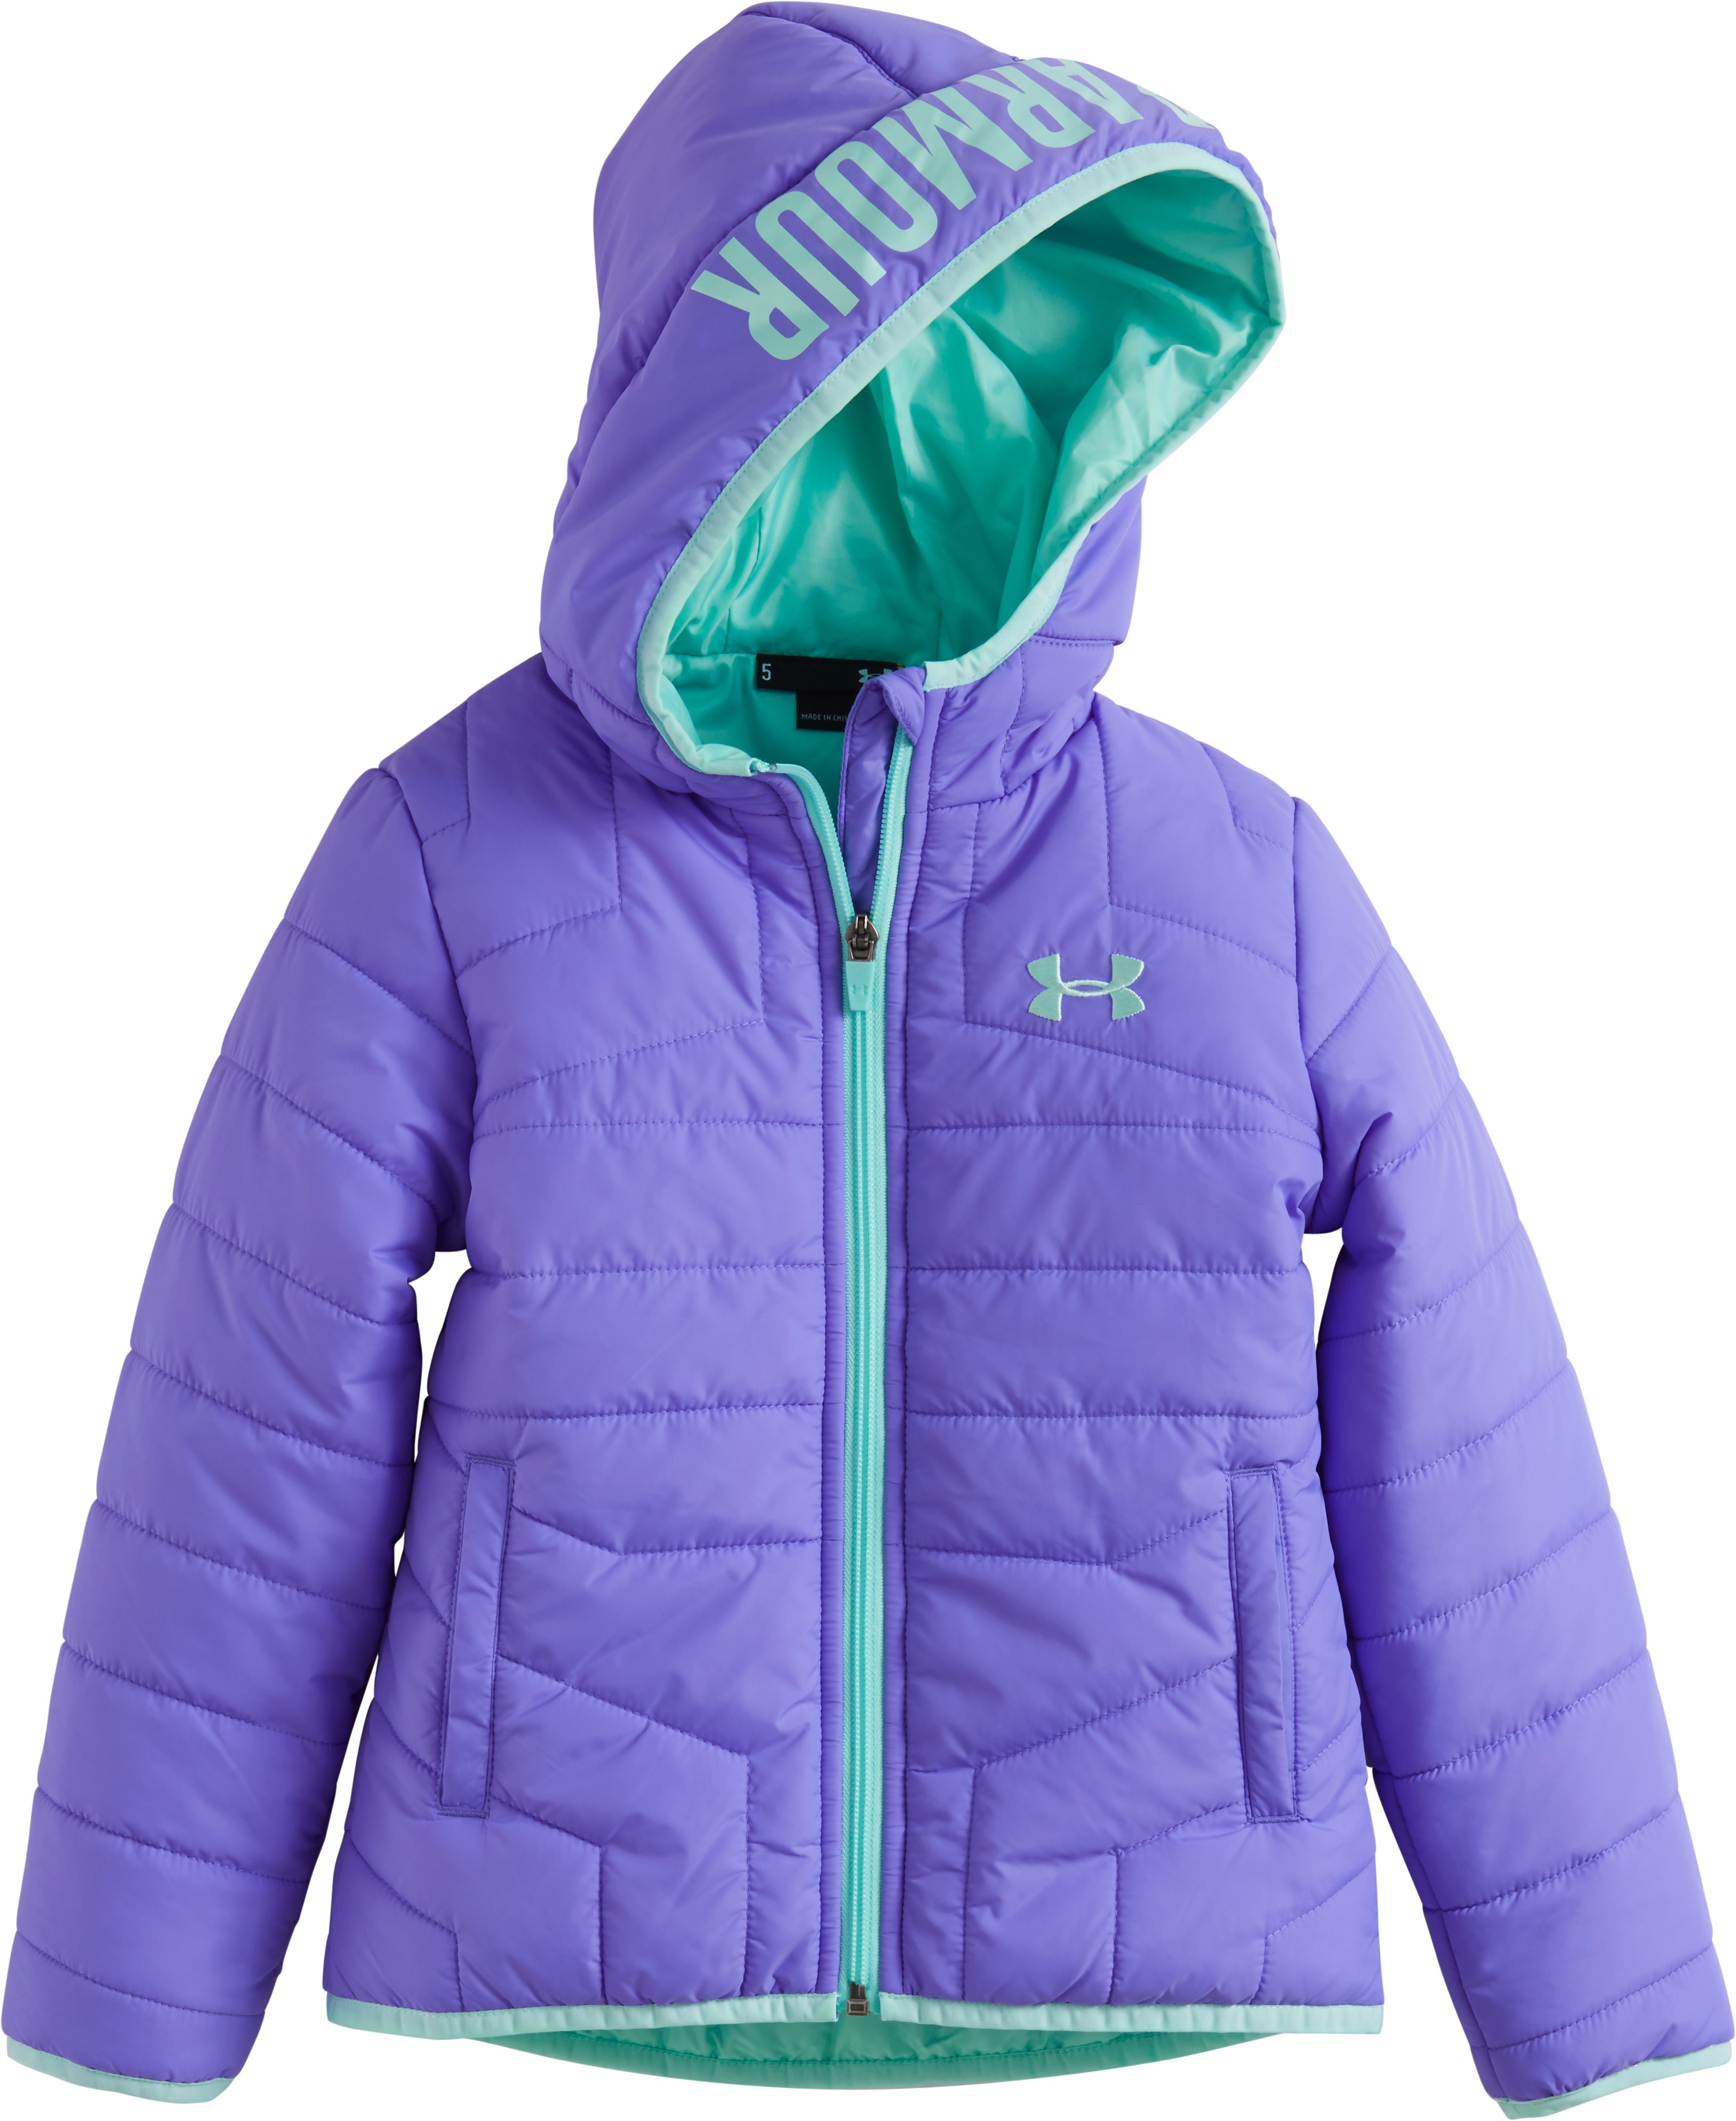 Girlsu0026#39; Toddler UA Feature Puffer Jacket   Under Armour US